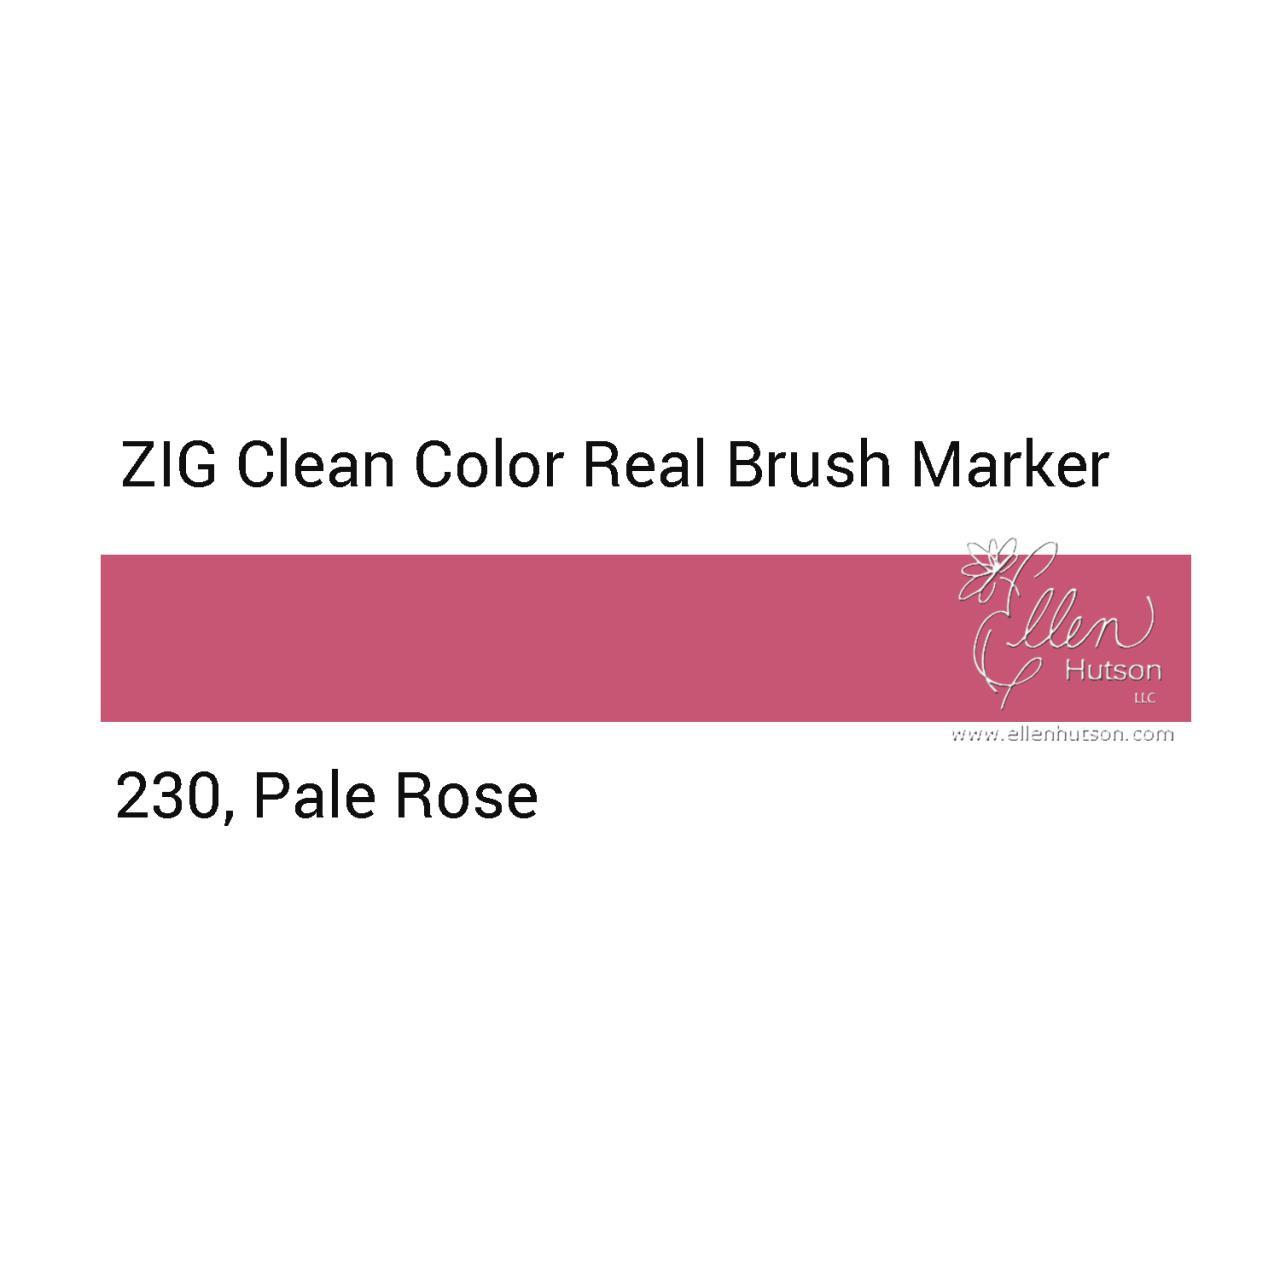 230 - Pale Rose, ZIG Clean Color Real Brush Marker -